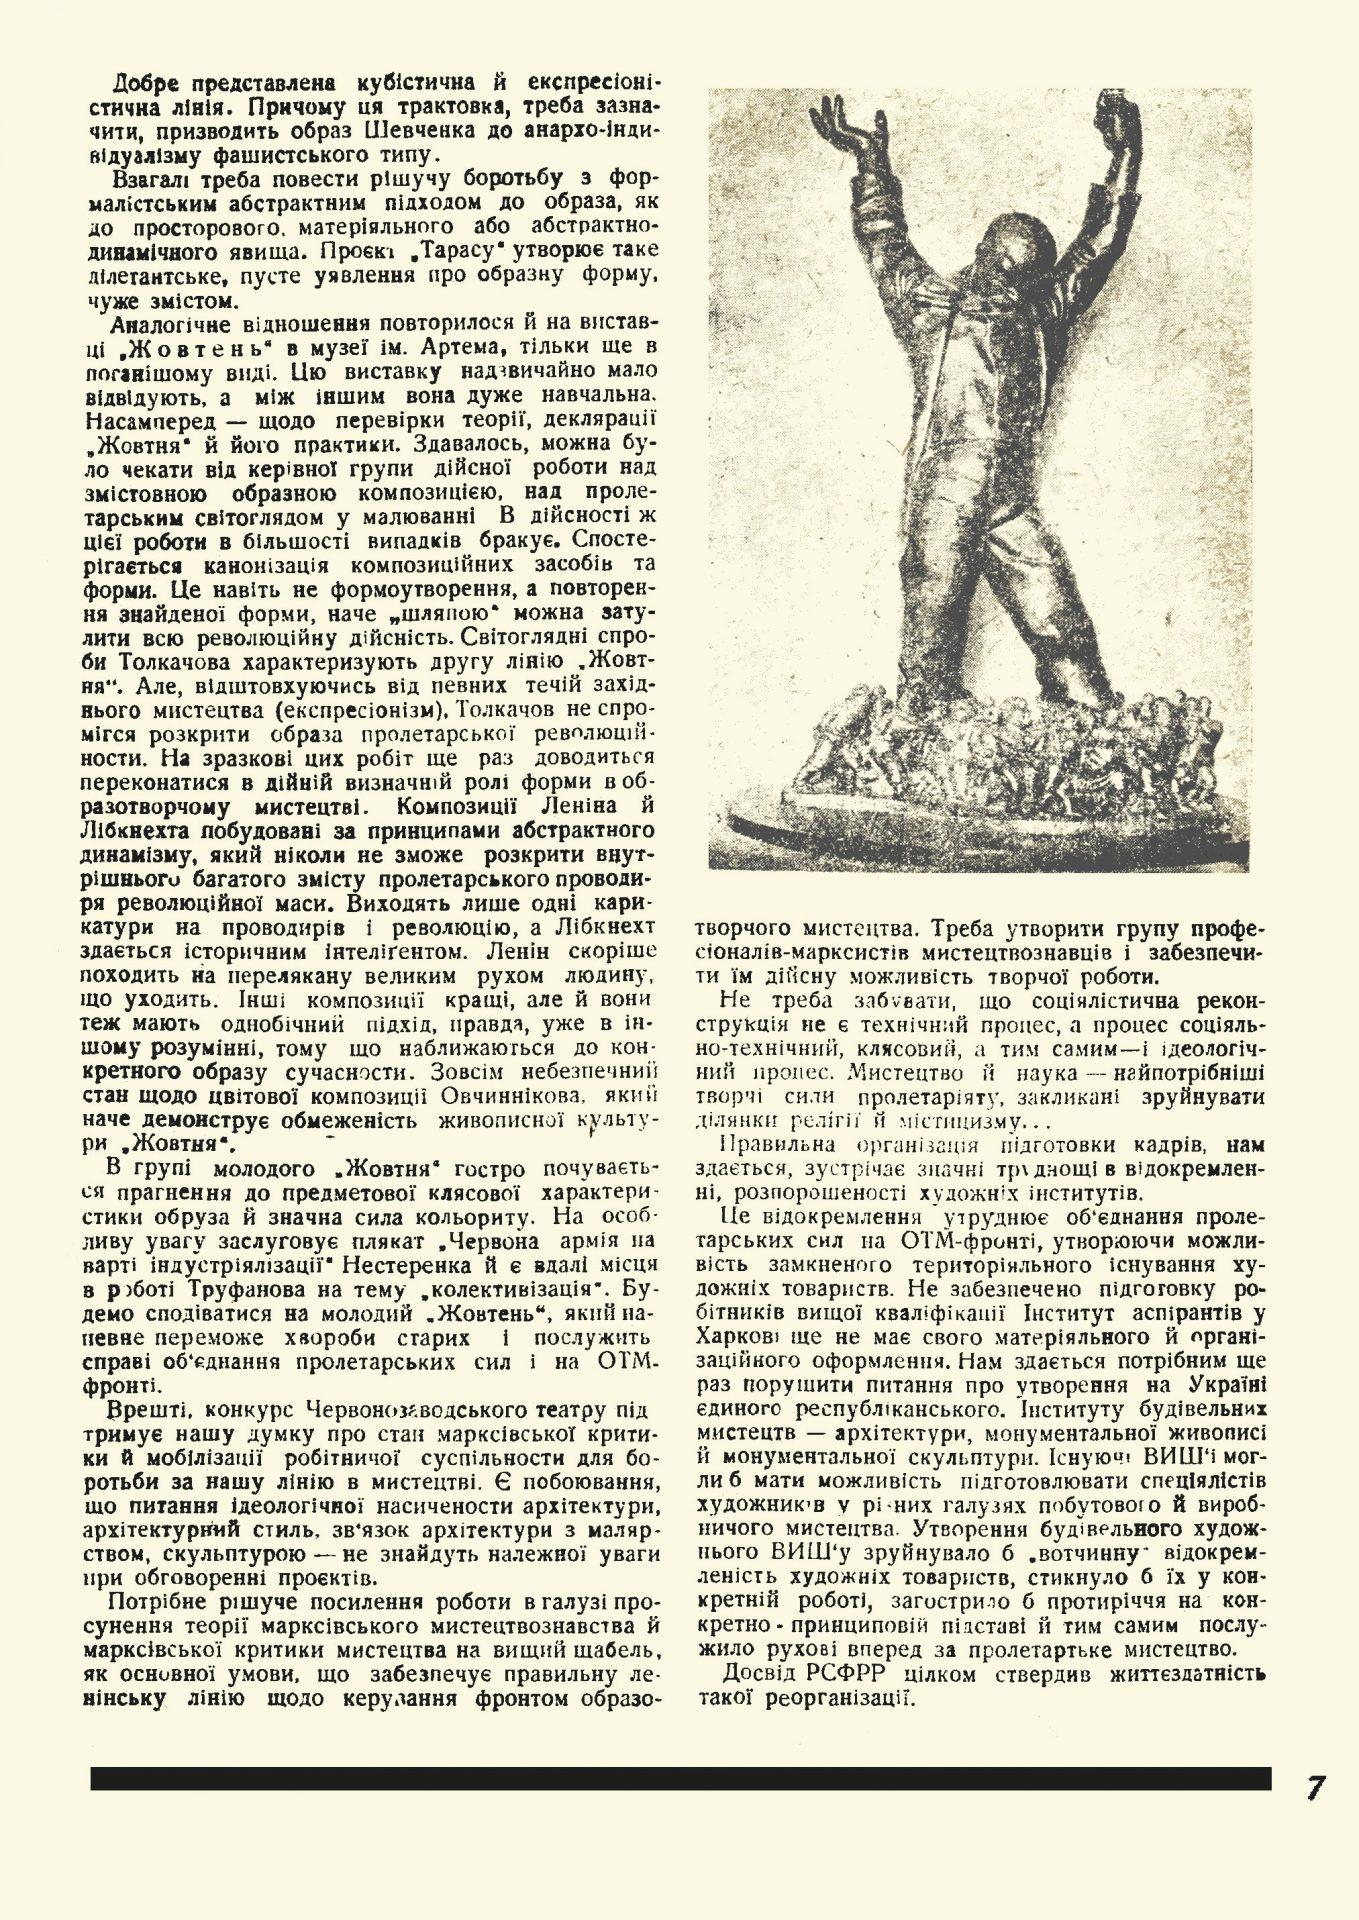 Мистецька трибуна_1931_№5-6